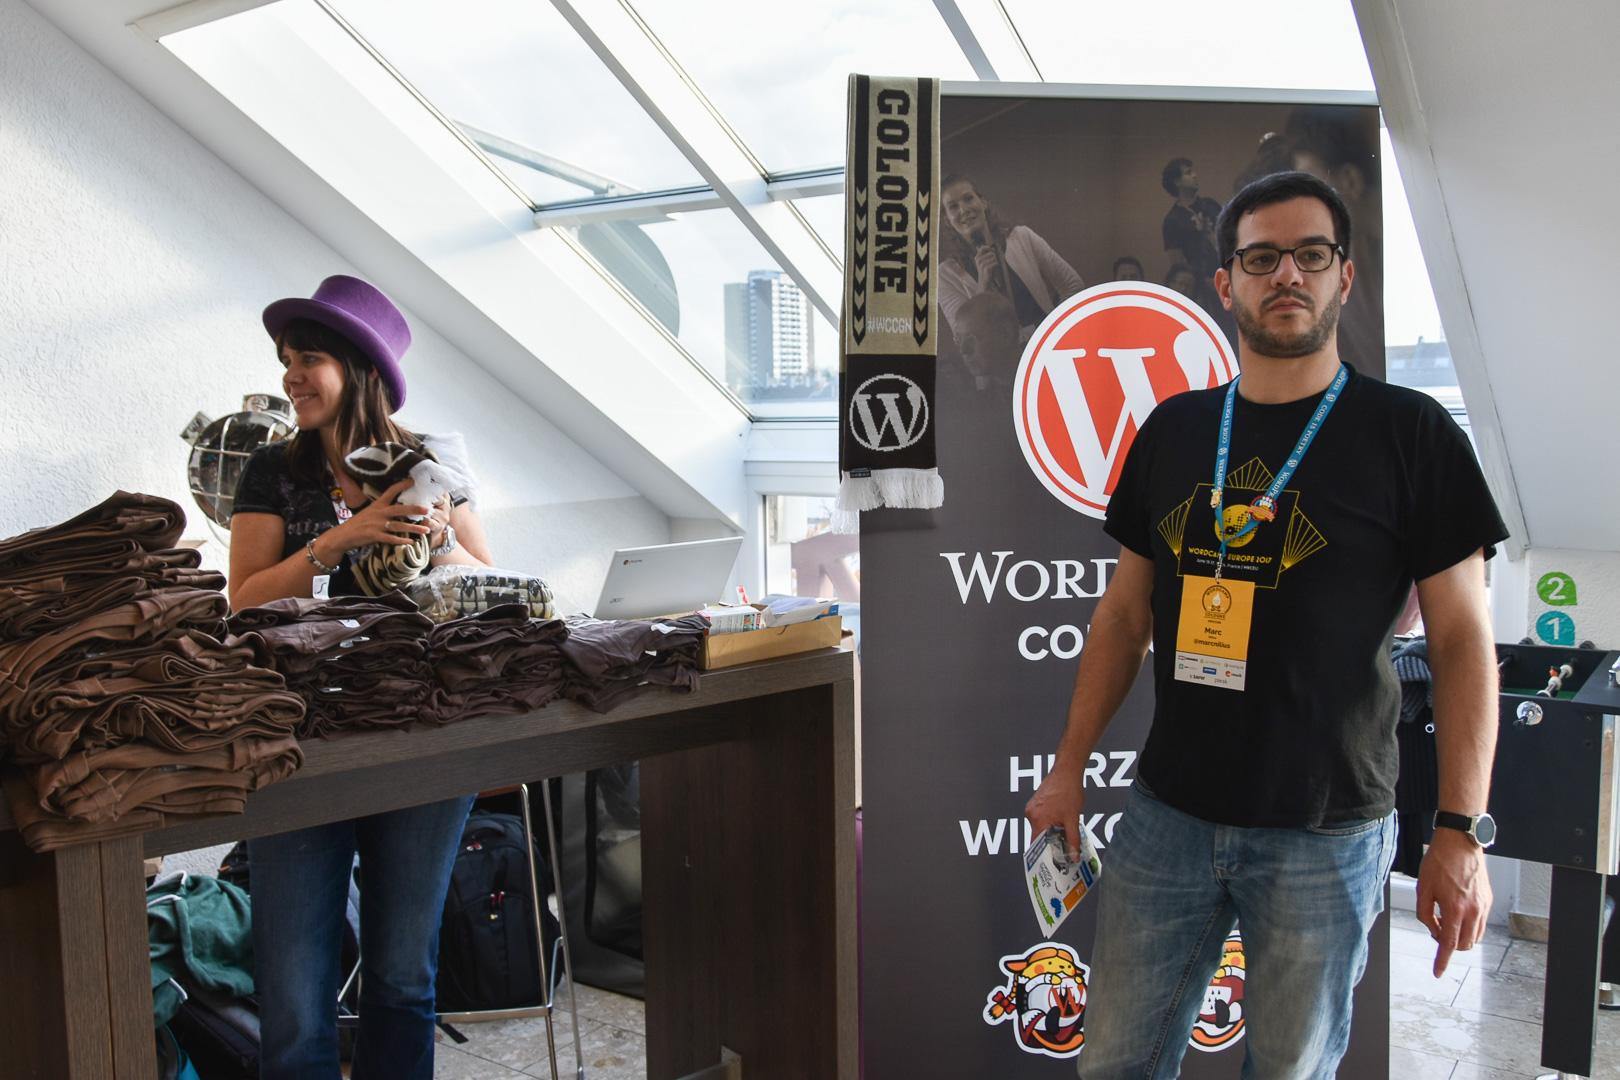 WordCamp Cologne, registration Desk, Carole Olinger and lead organizer Marc Nilius